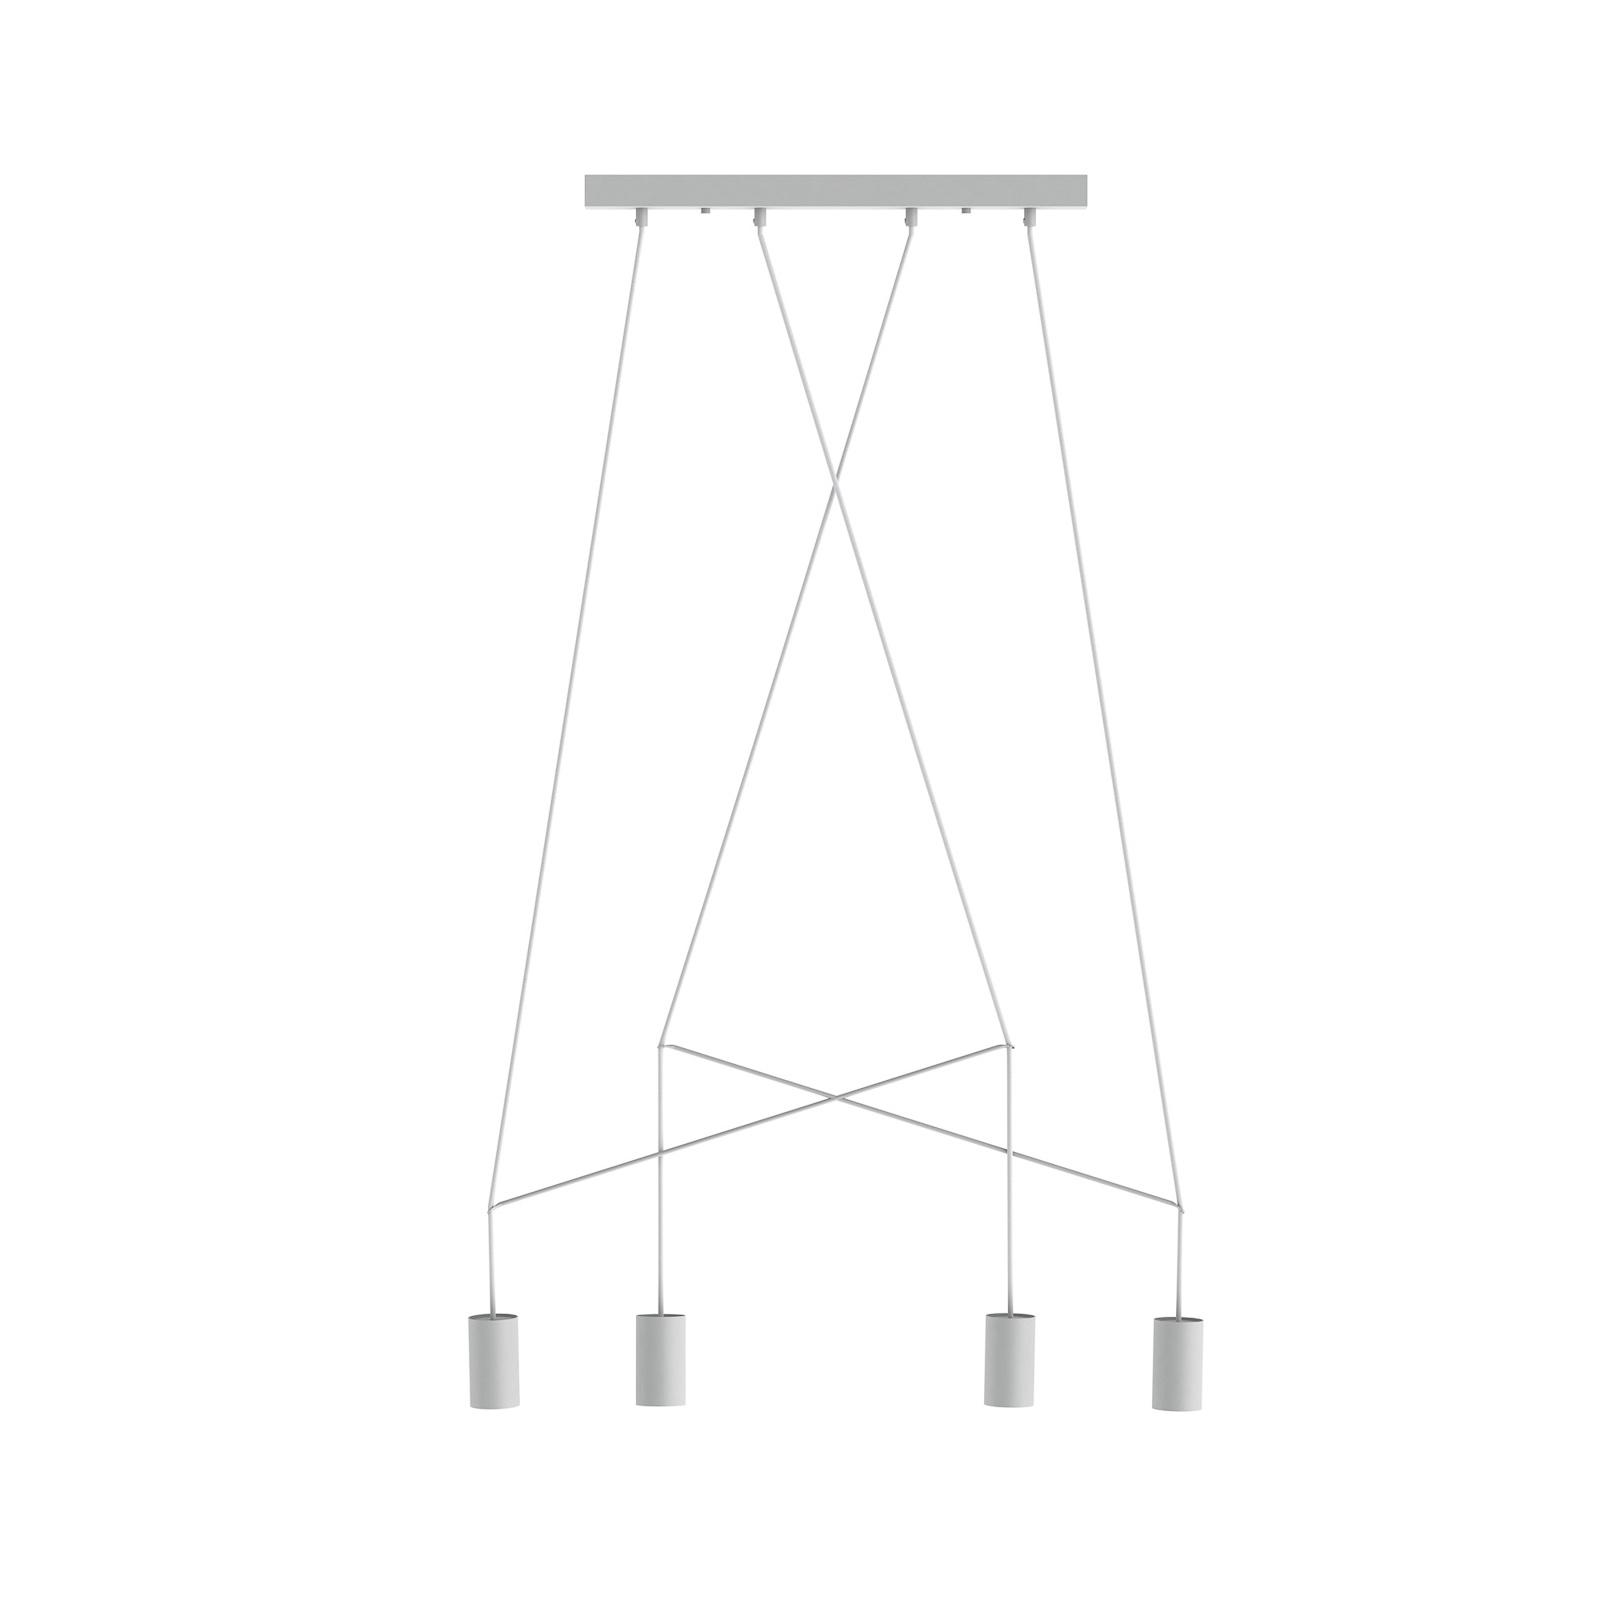 Suspension Imbria, à 4 lampes, blanche